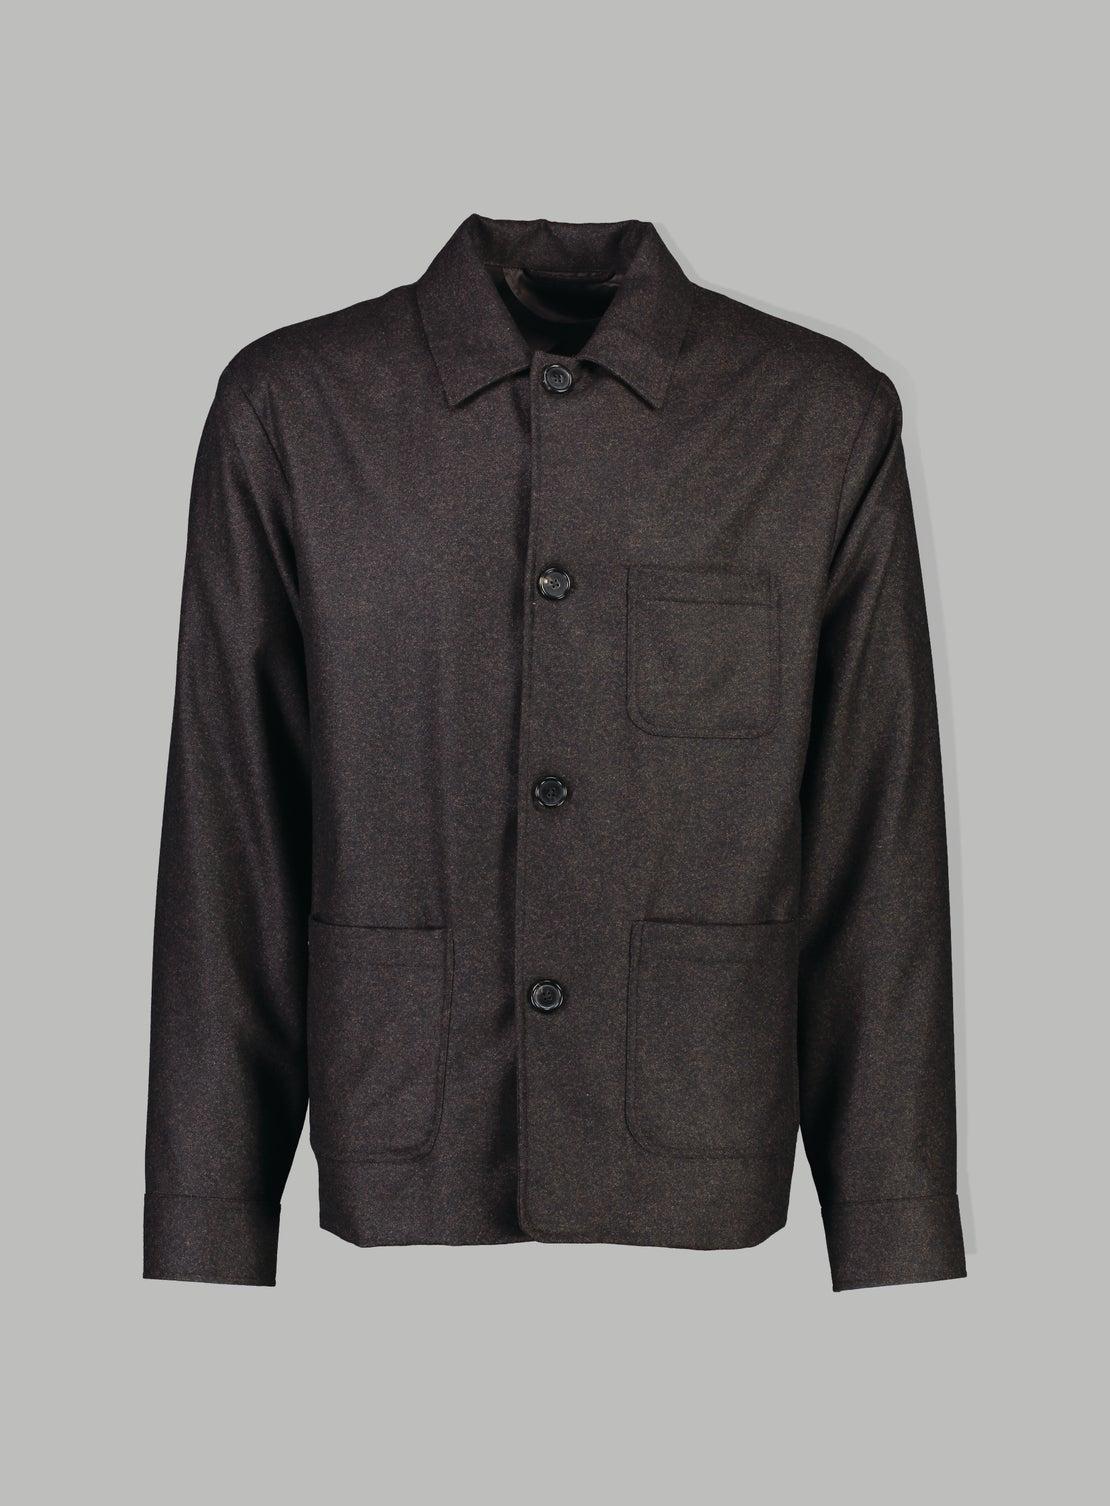 Chocolate Flannel Coat